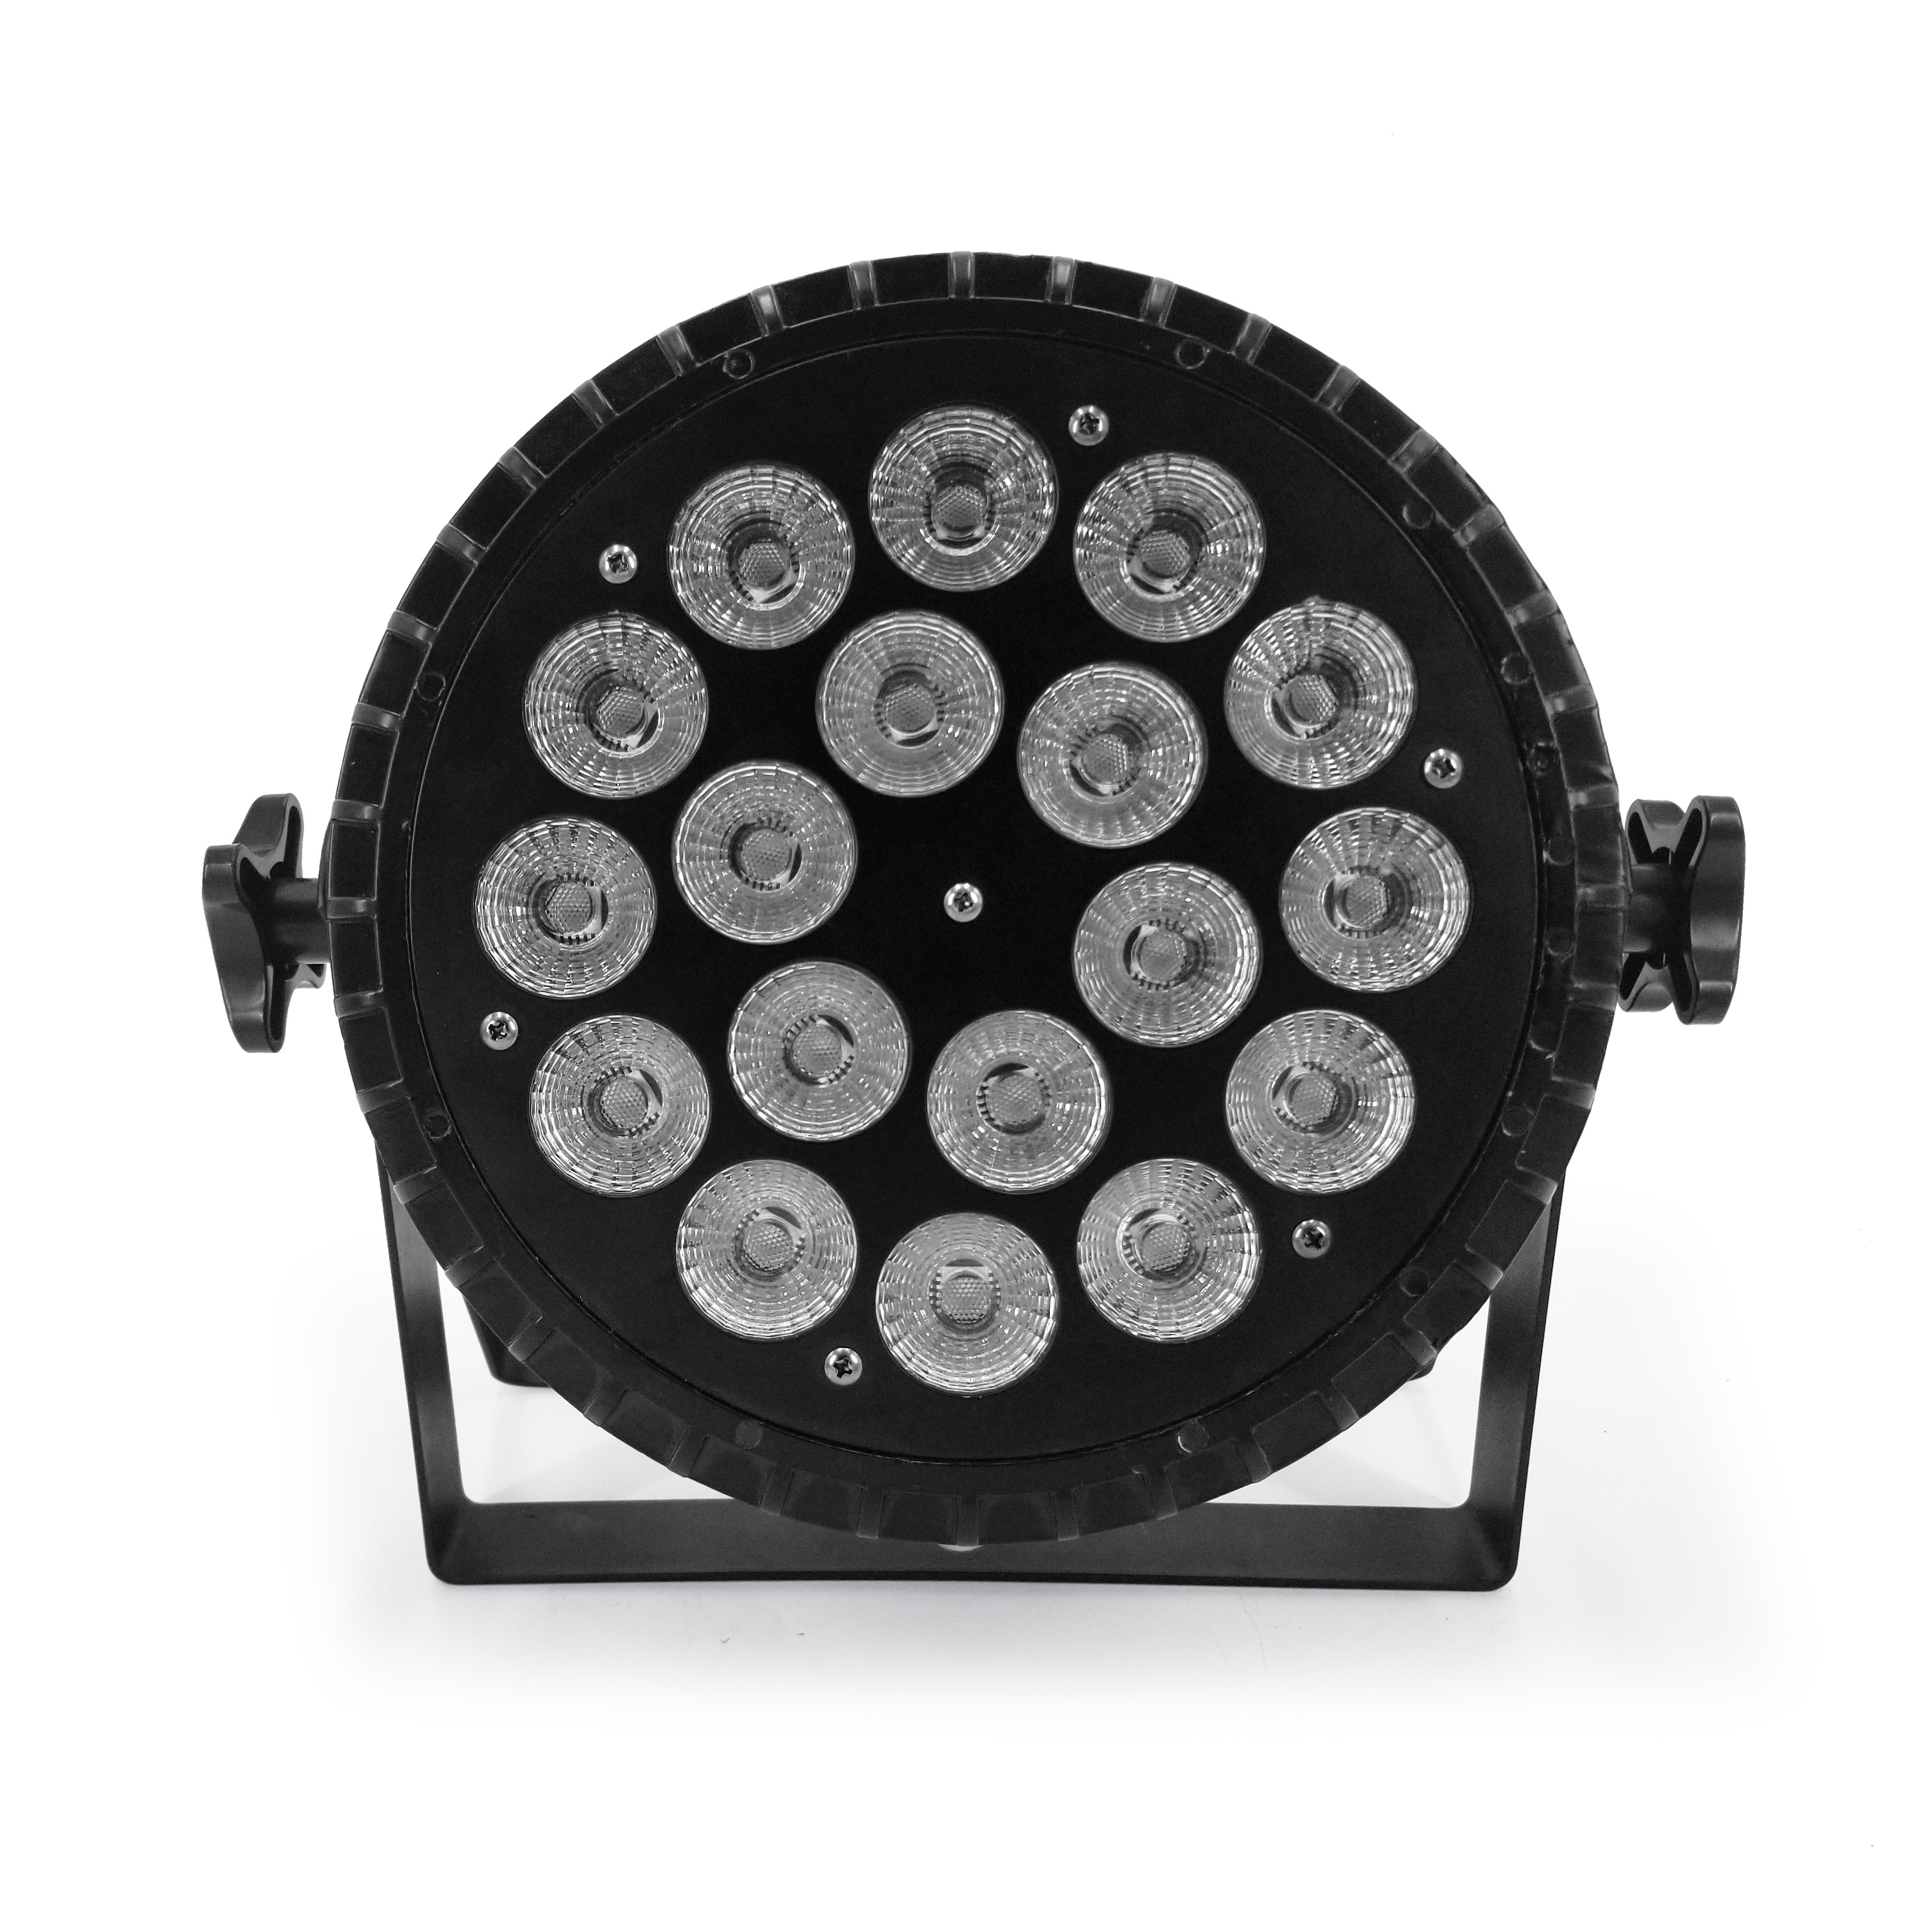 Led Par Light 18x18W RGBWA UV 6in1 Led Wash Lights LED Flat Par Can Stage Lighting With Silent Fan 18x12w RGBW